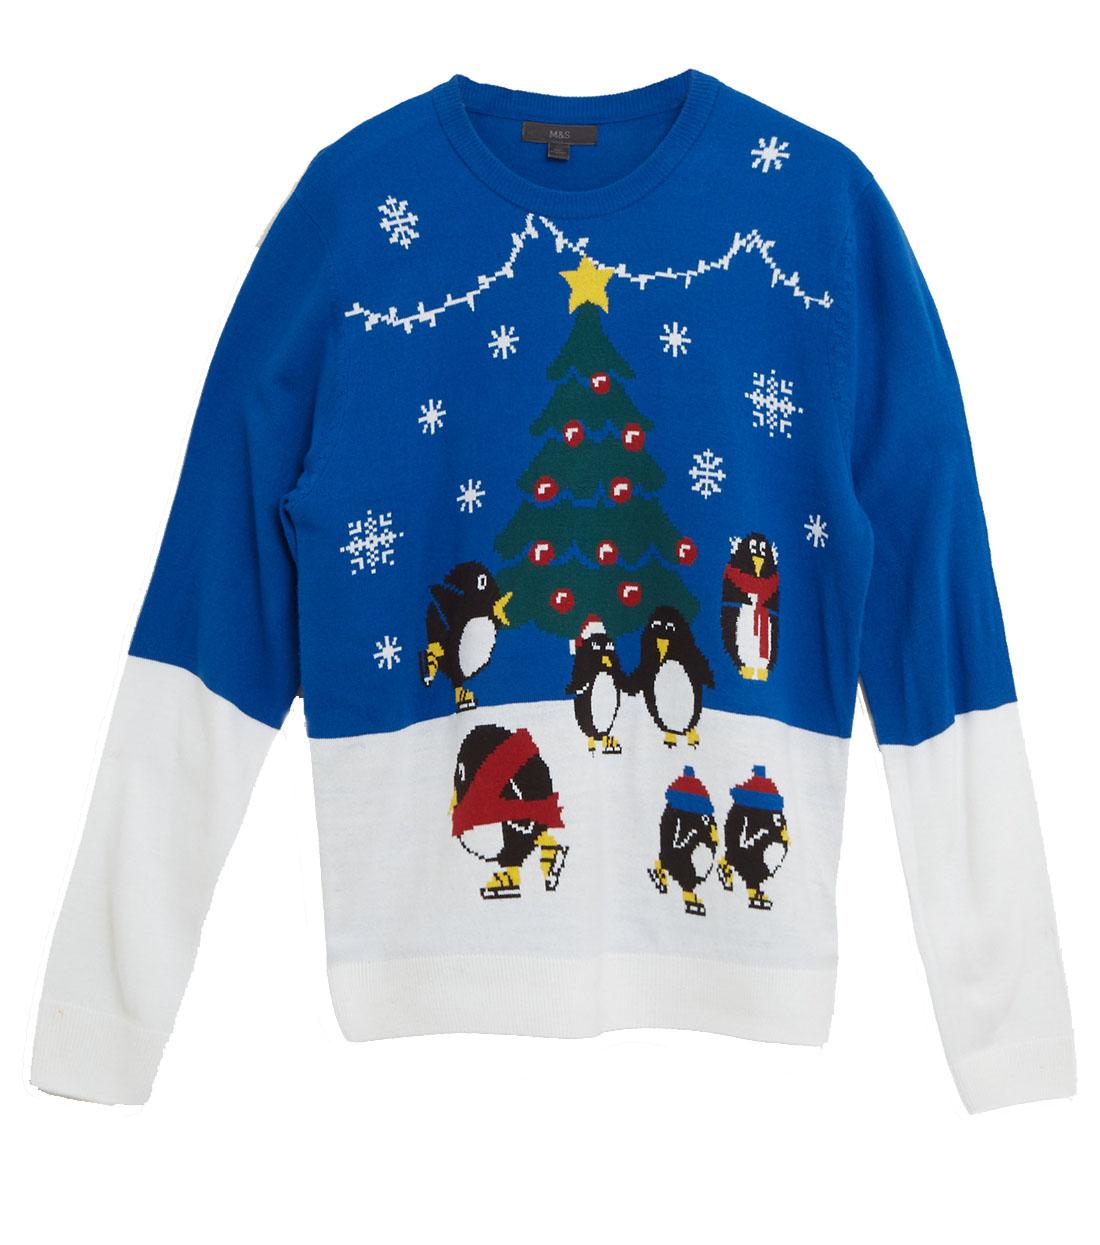 Pulls de Noël 2020 - Mark & Spencer